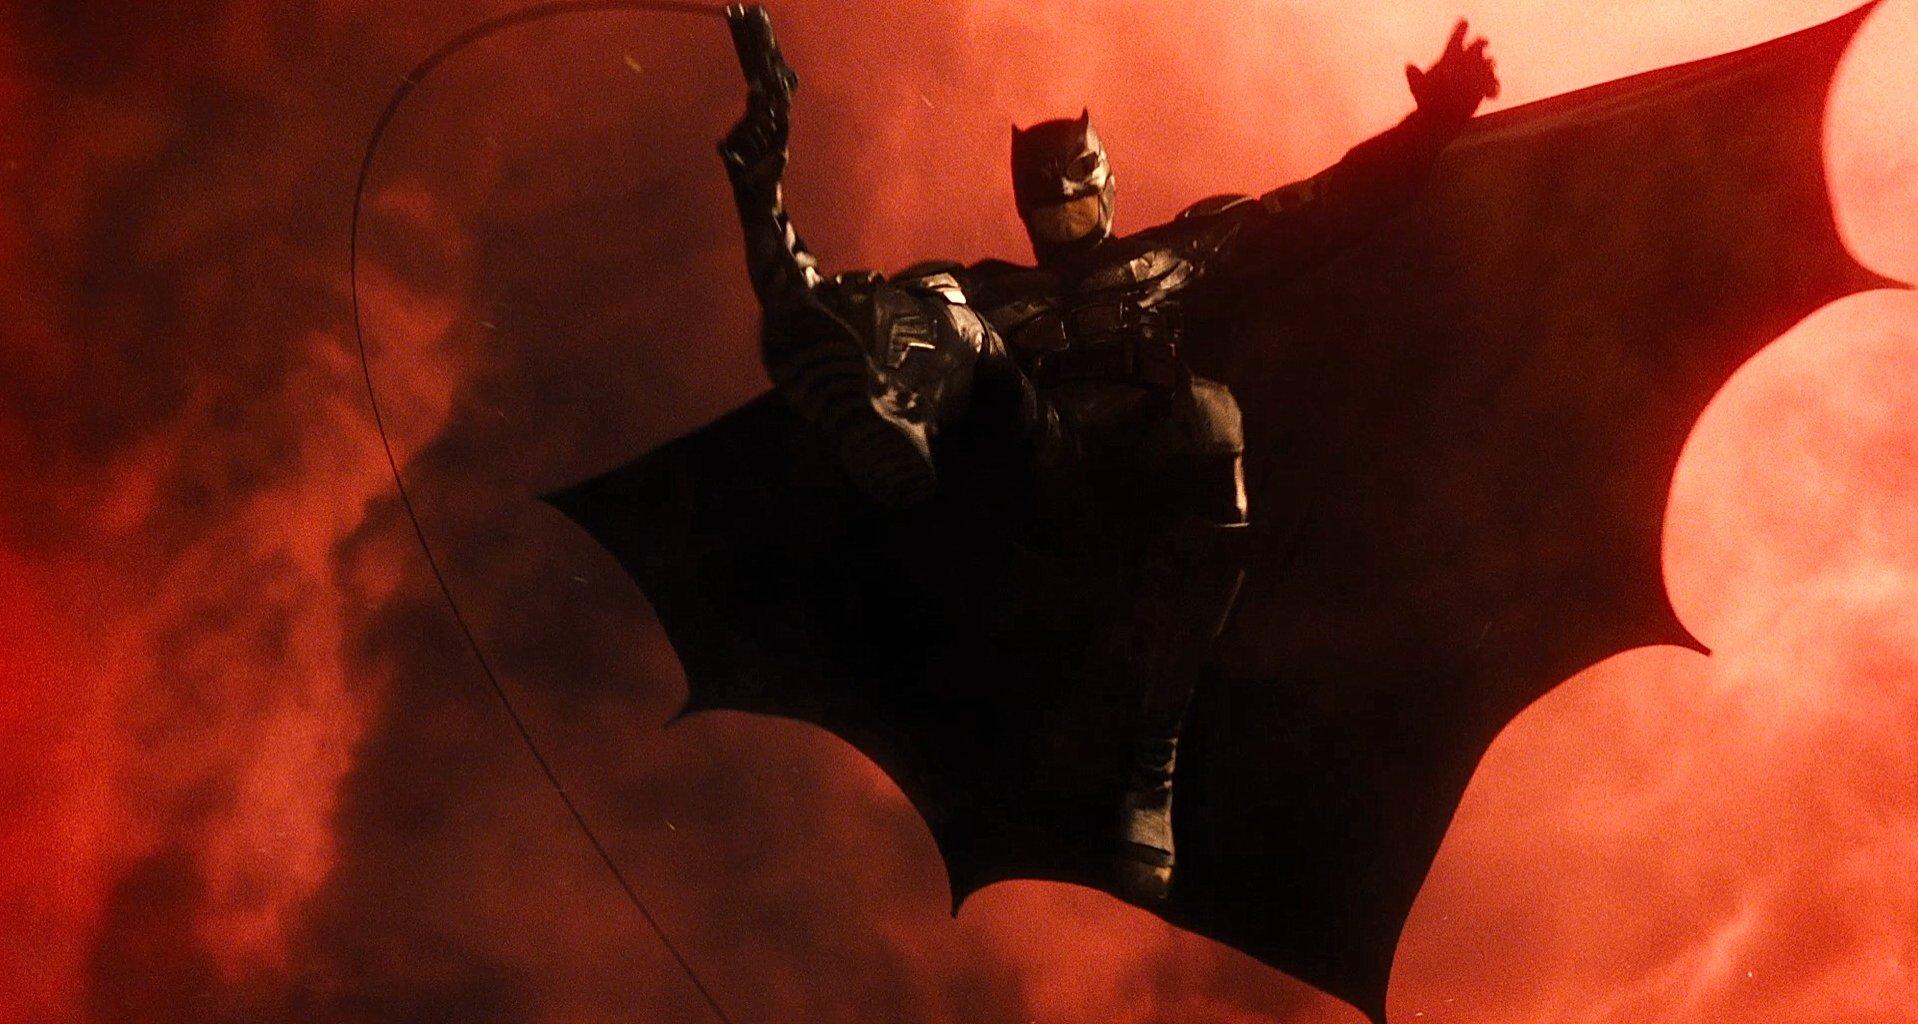 Happy birthday to The Batman himself, Ben Affleck!